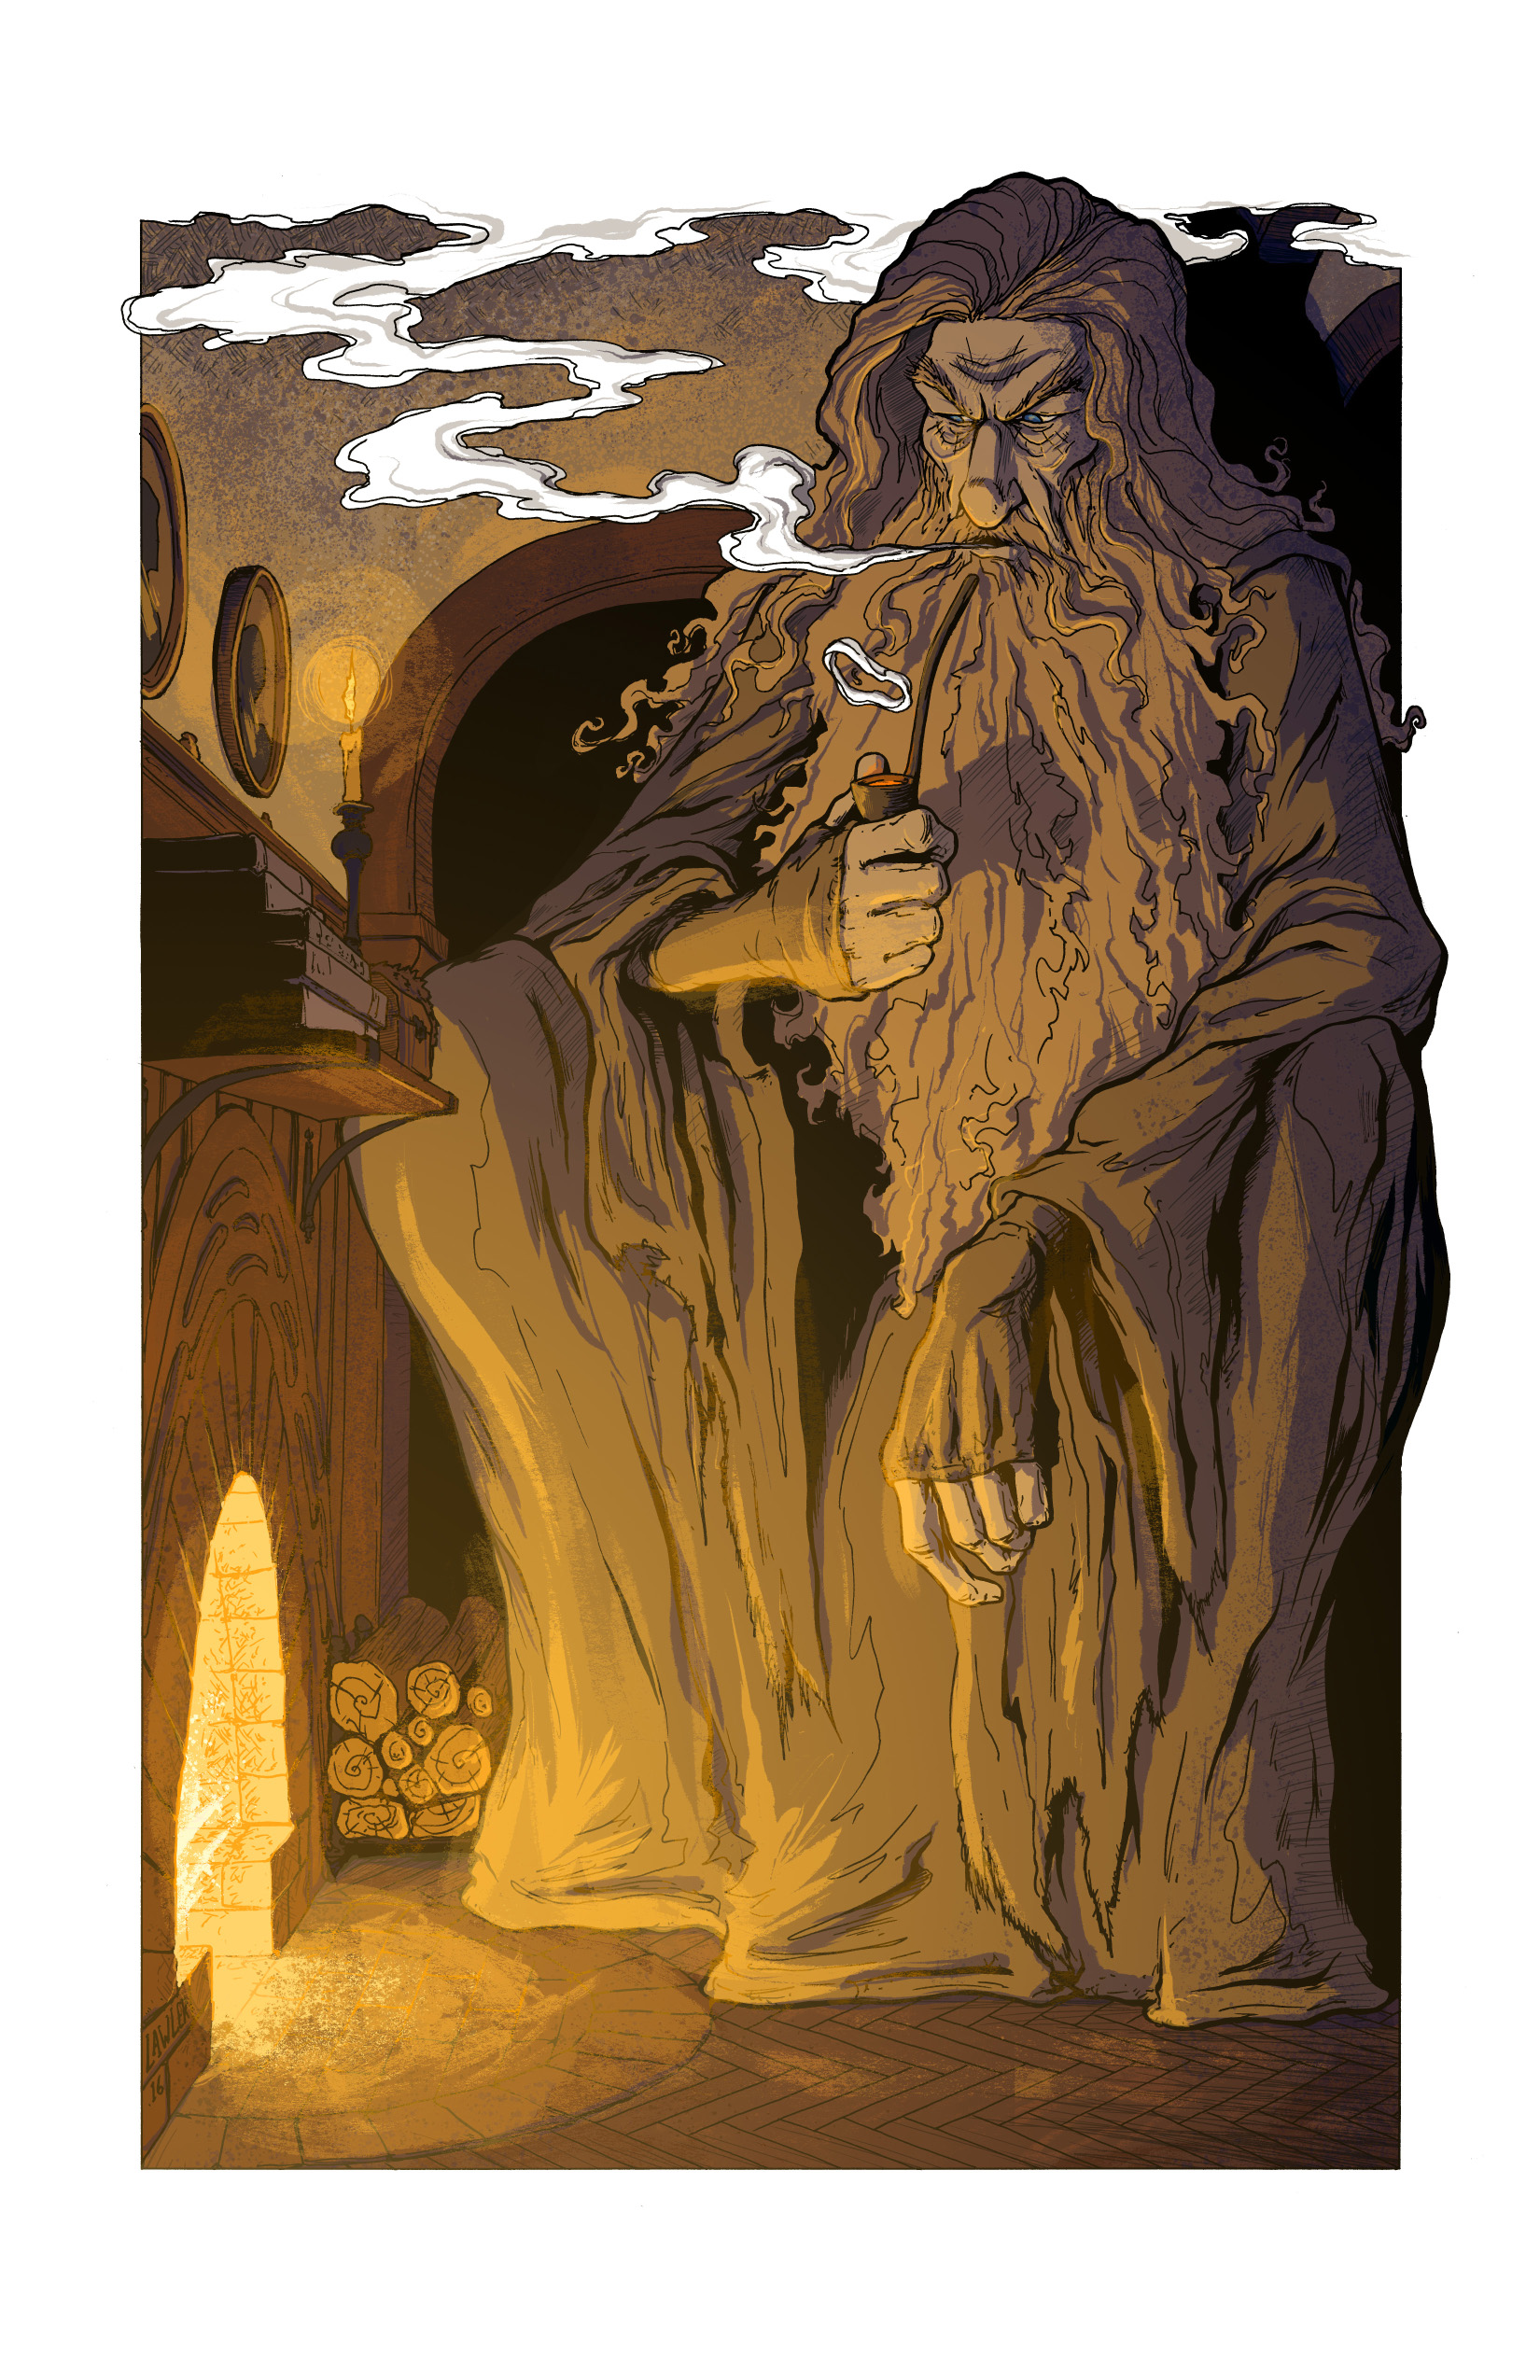 LotR_Gandalf_11x17.jpg